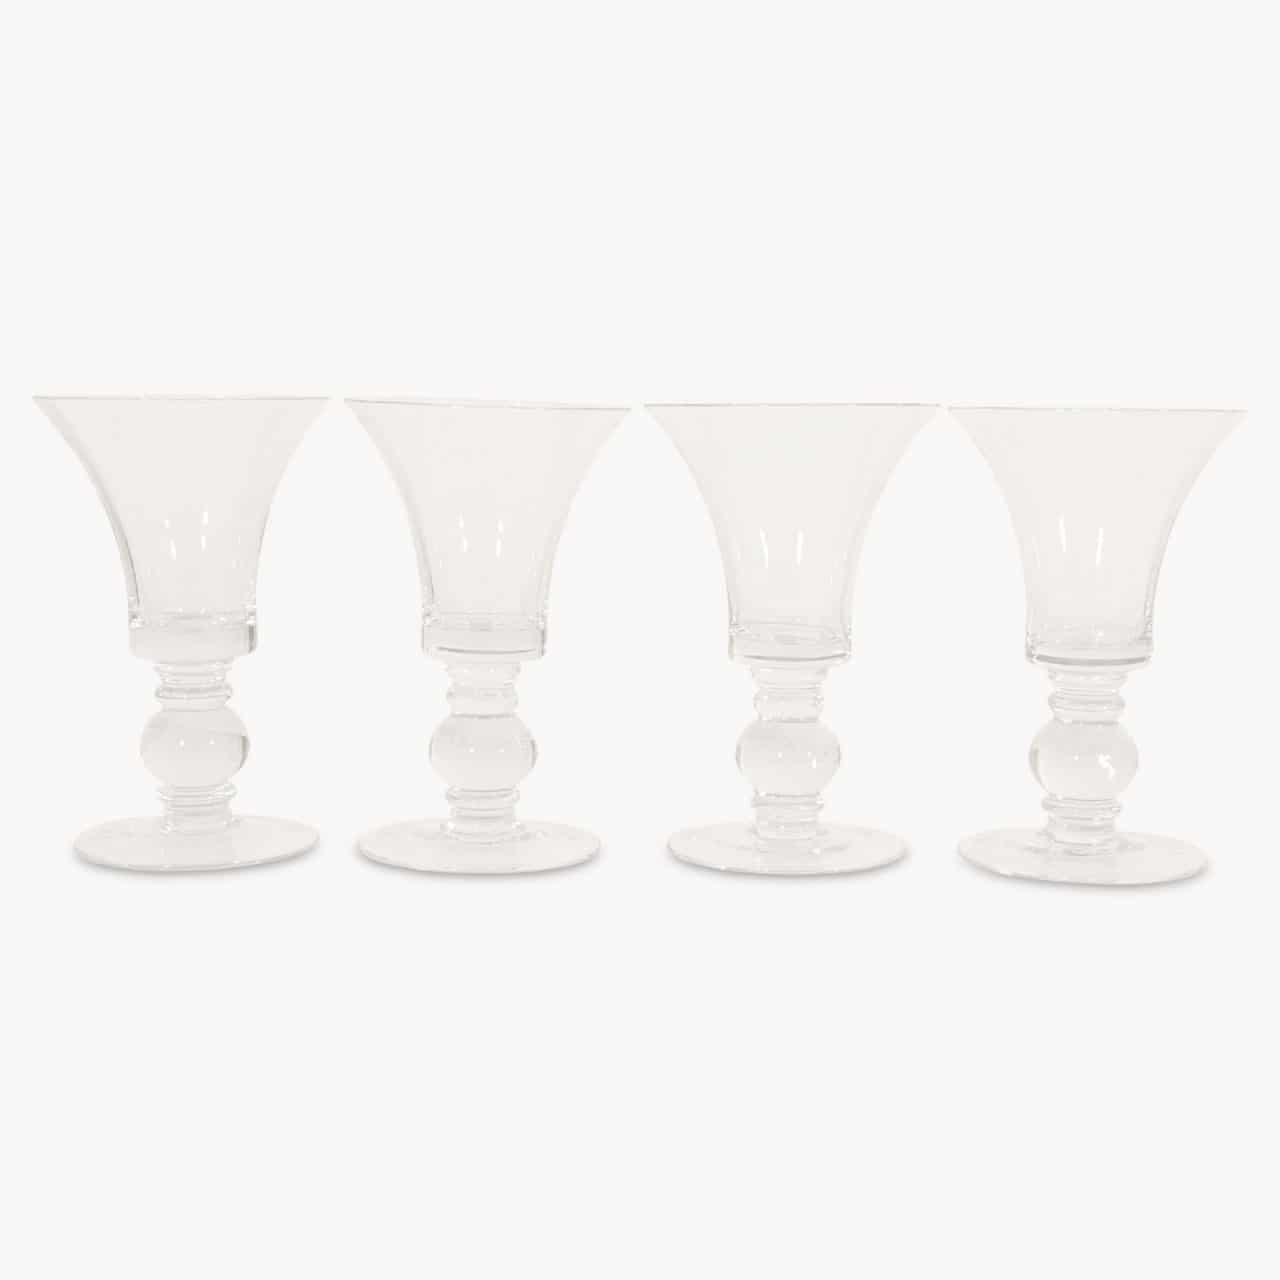 thornton-white-wine-glass-ba7011-1_1348